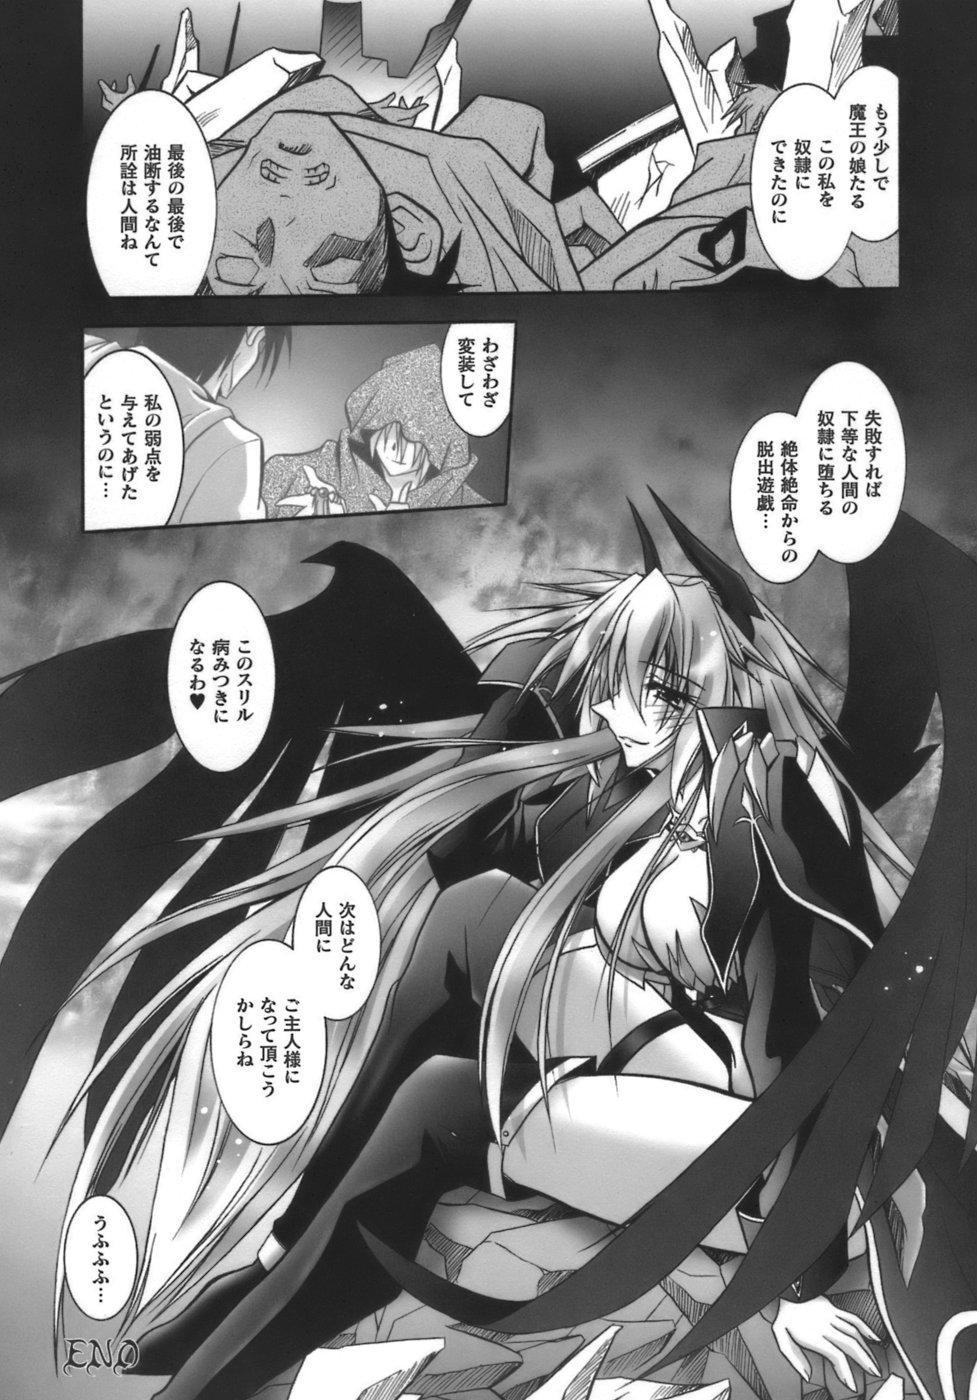 [Parfait] Datenshi-tachi no Chinkonka - Fallen Angels Requiem 24